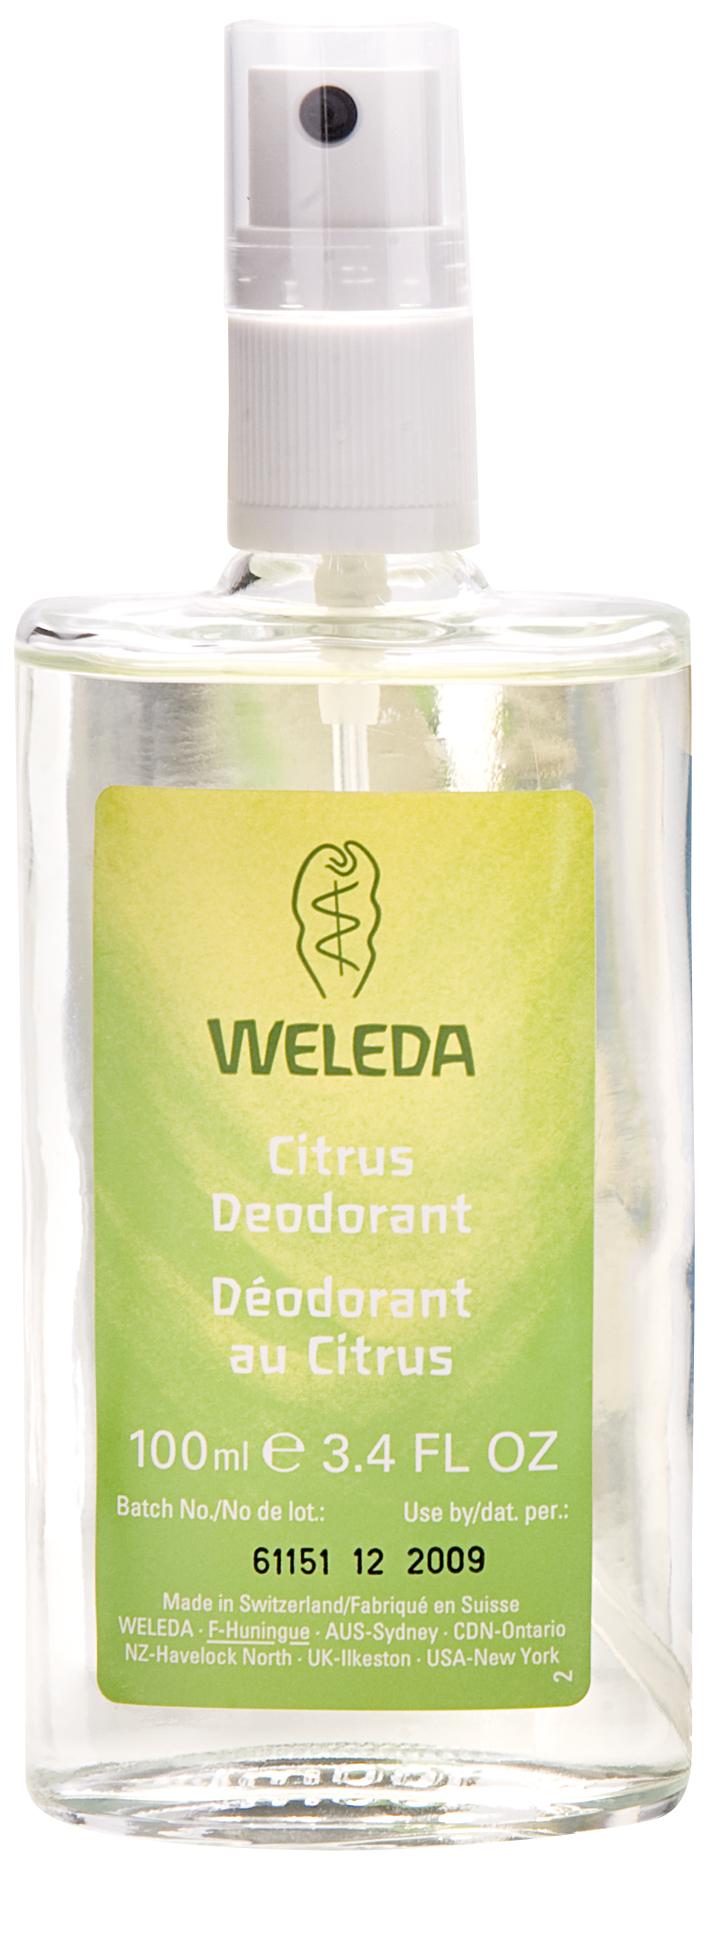 Weleda citrus deodorant review